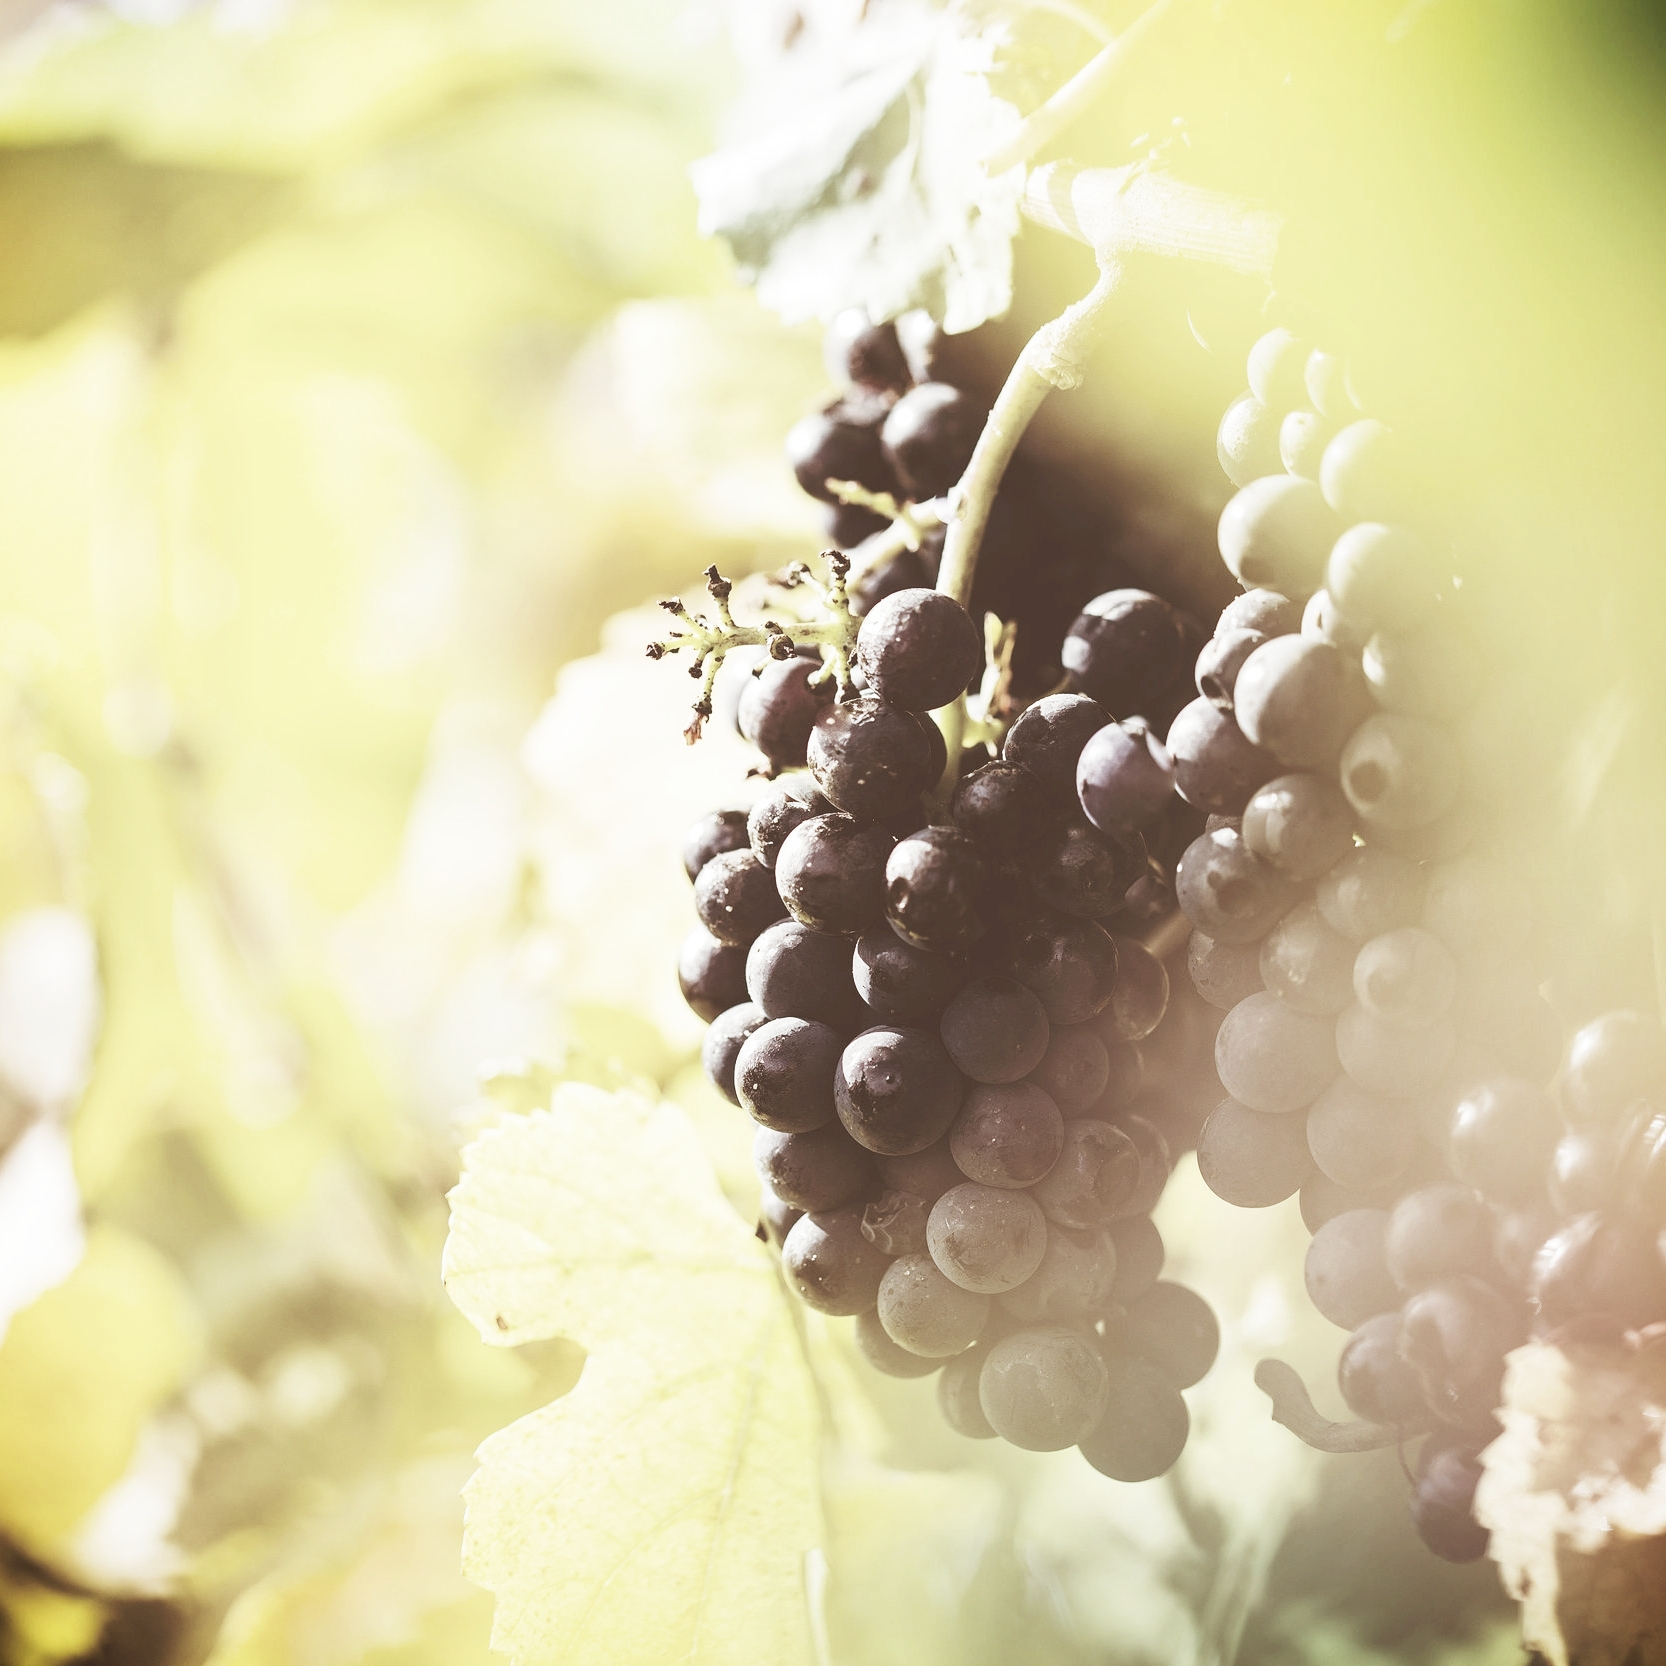 ripe-wine-grapes-in-vineyard-field-picjumbo-com.jpg